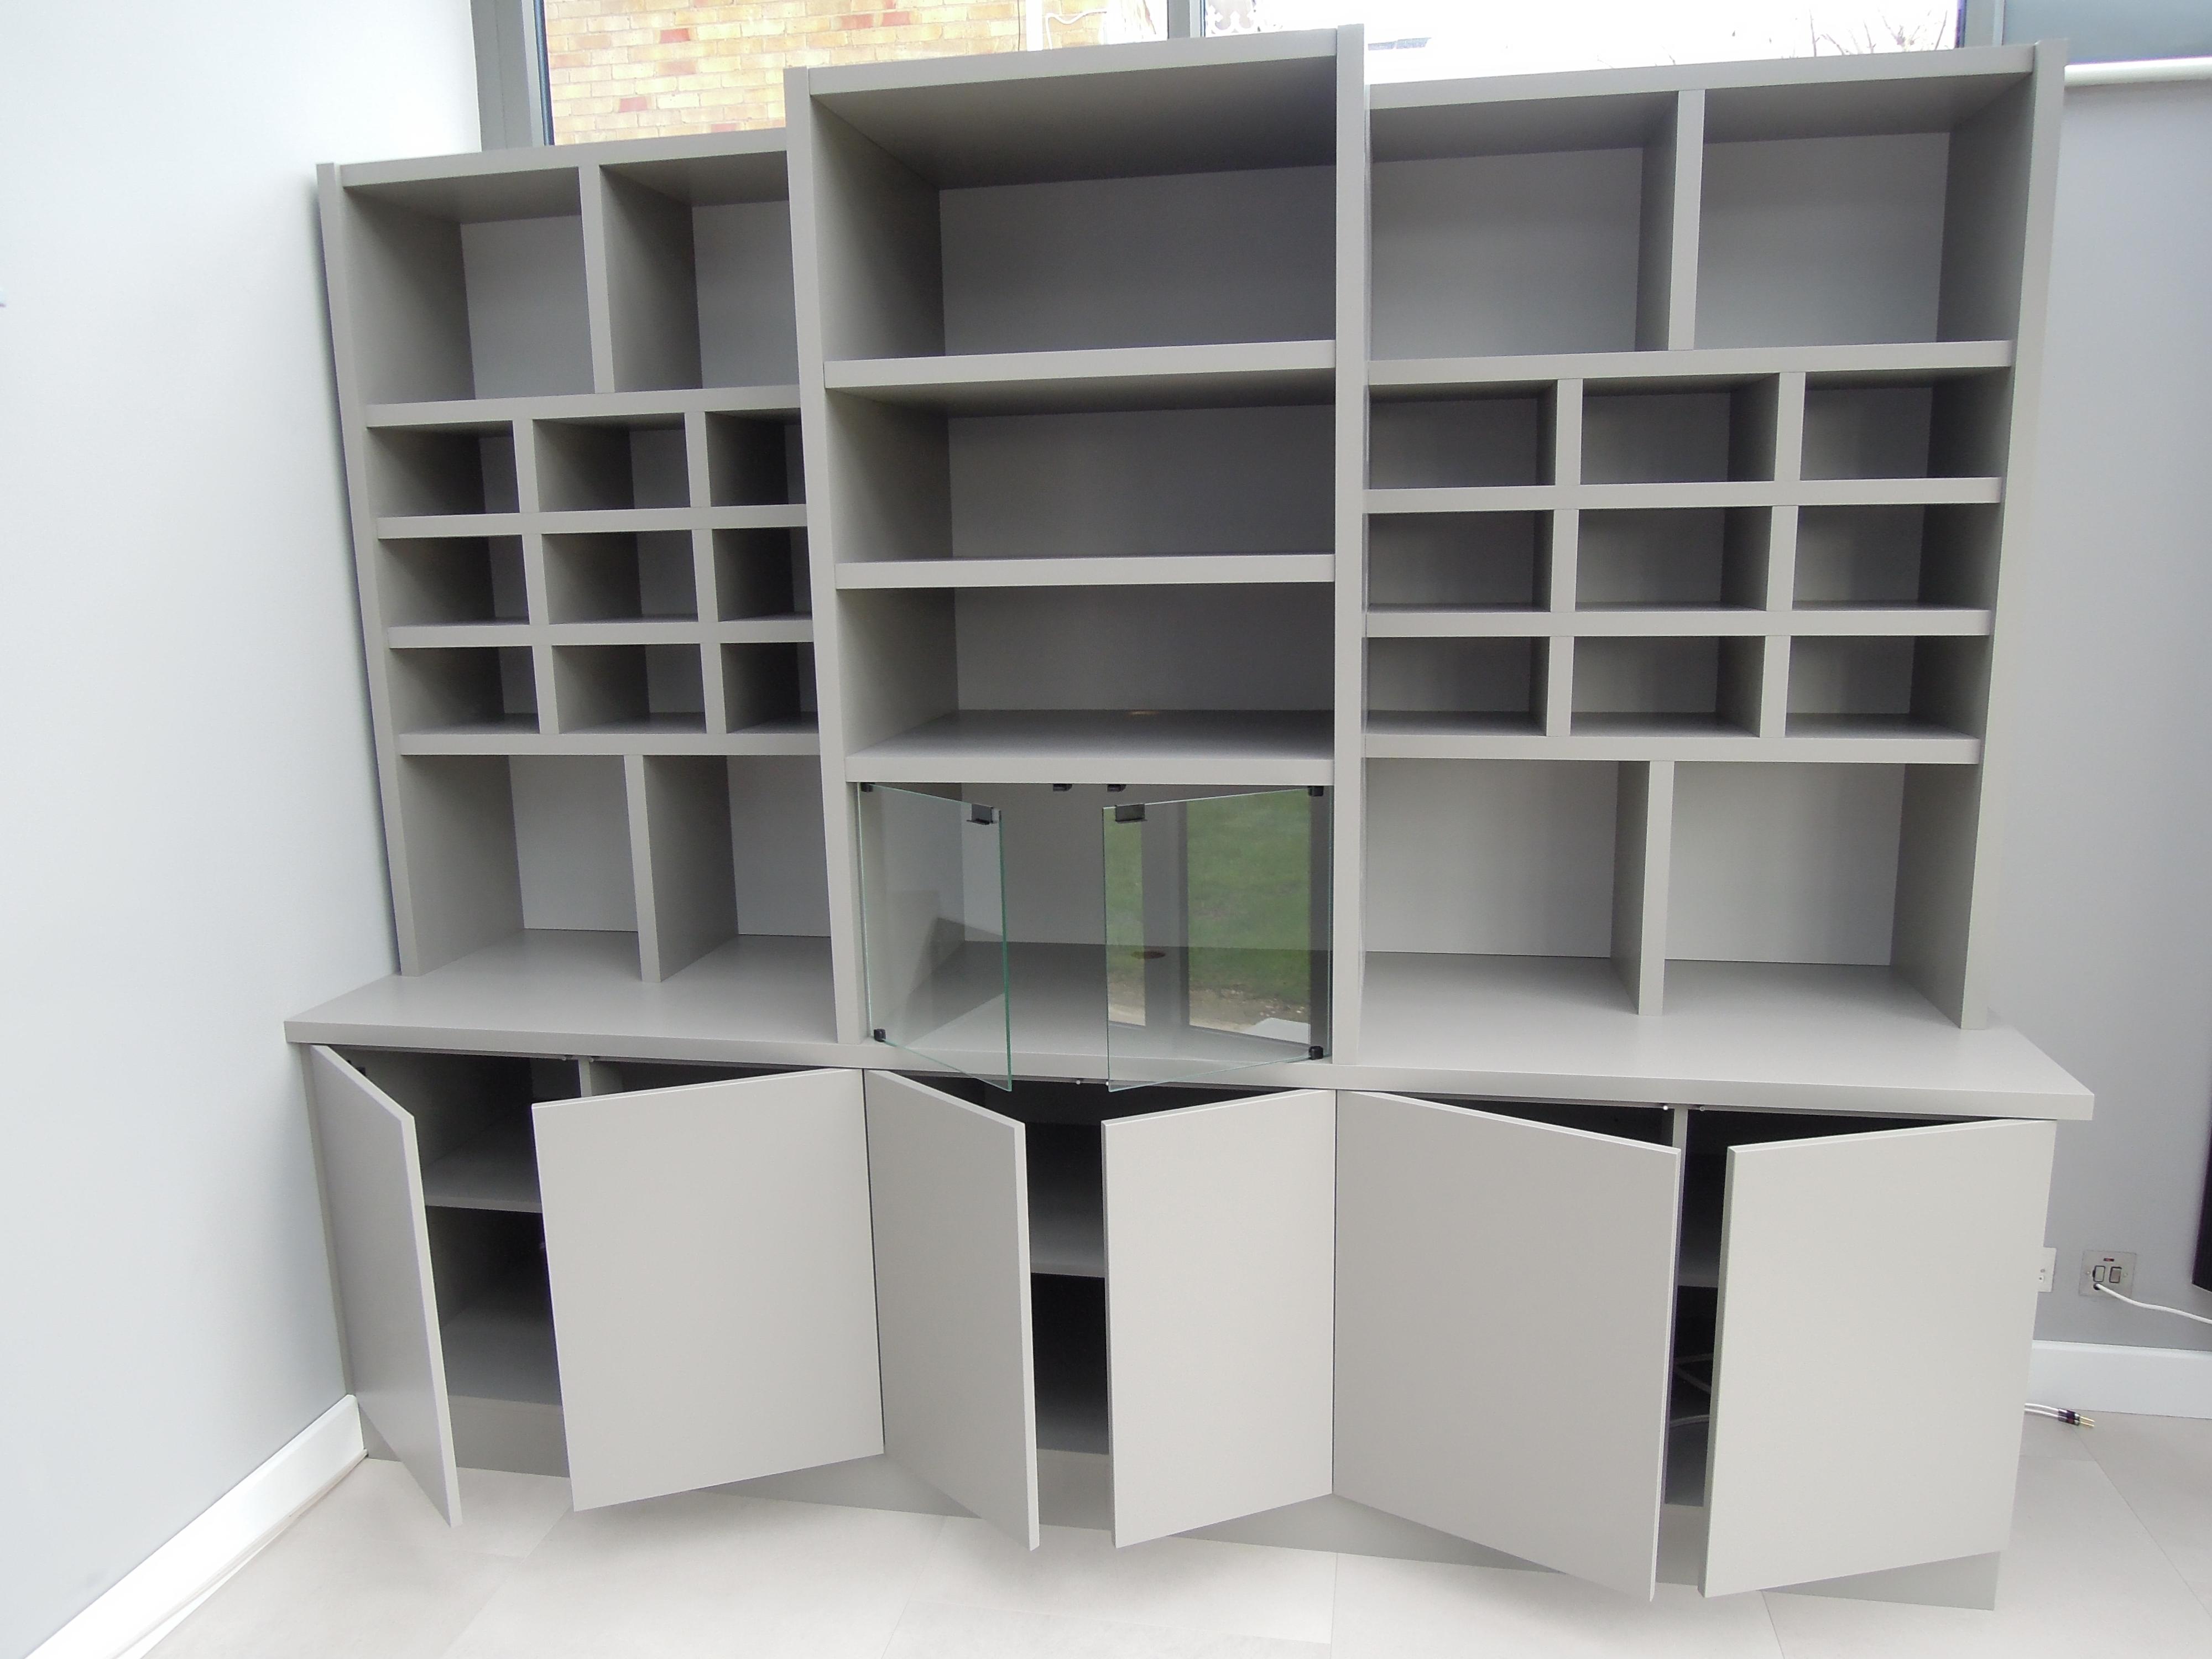 harrow carpenters lj refurbishments bookcases and cupboards